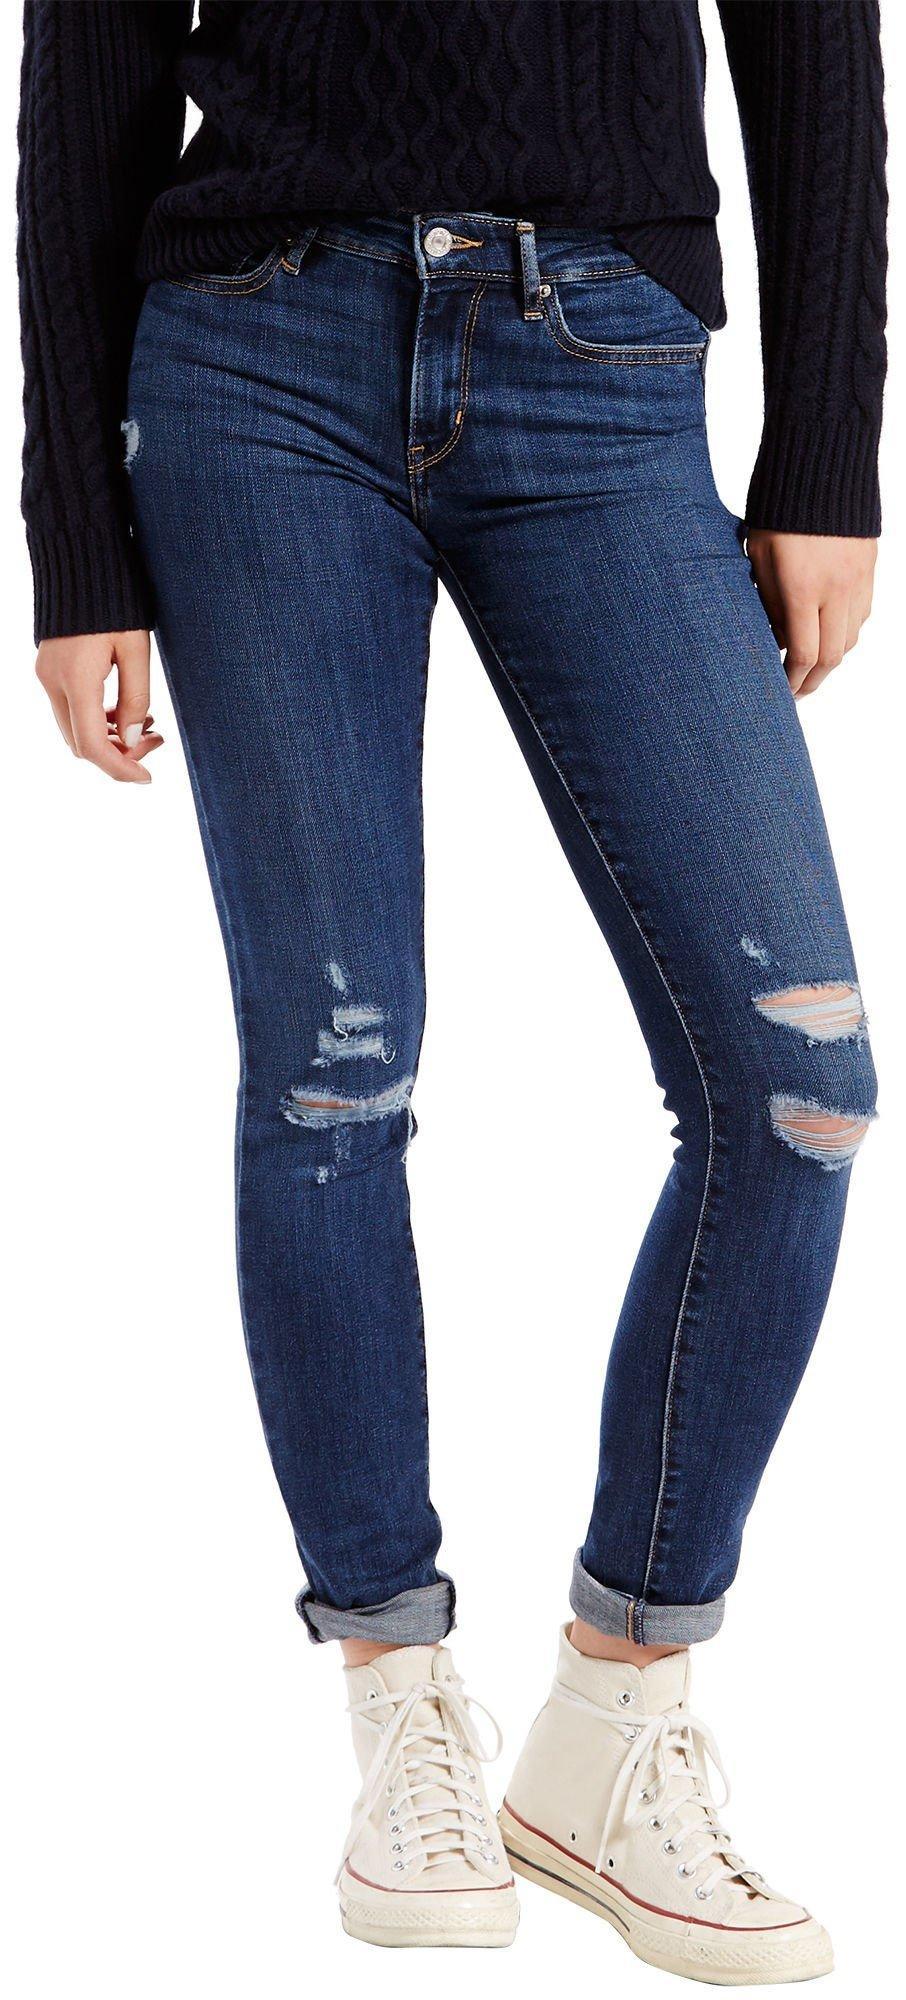 Levi's Womens 711 Skinny Leg Jeans | Bealls Florida